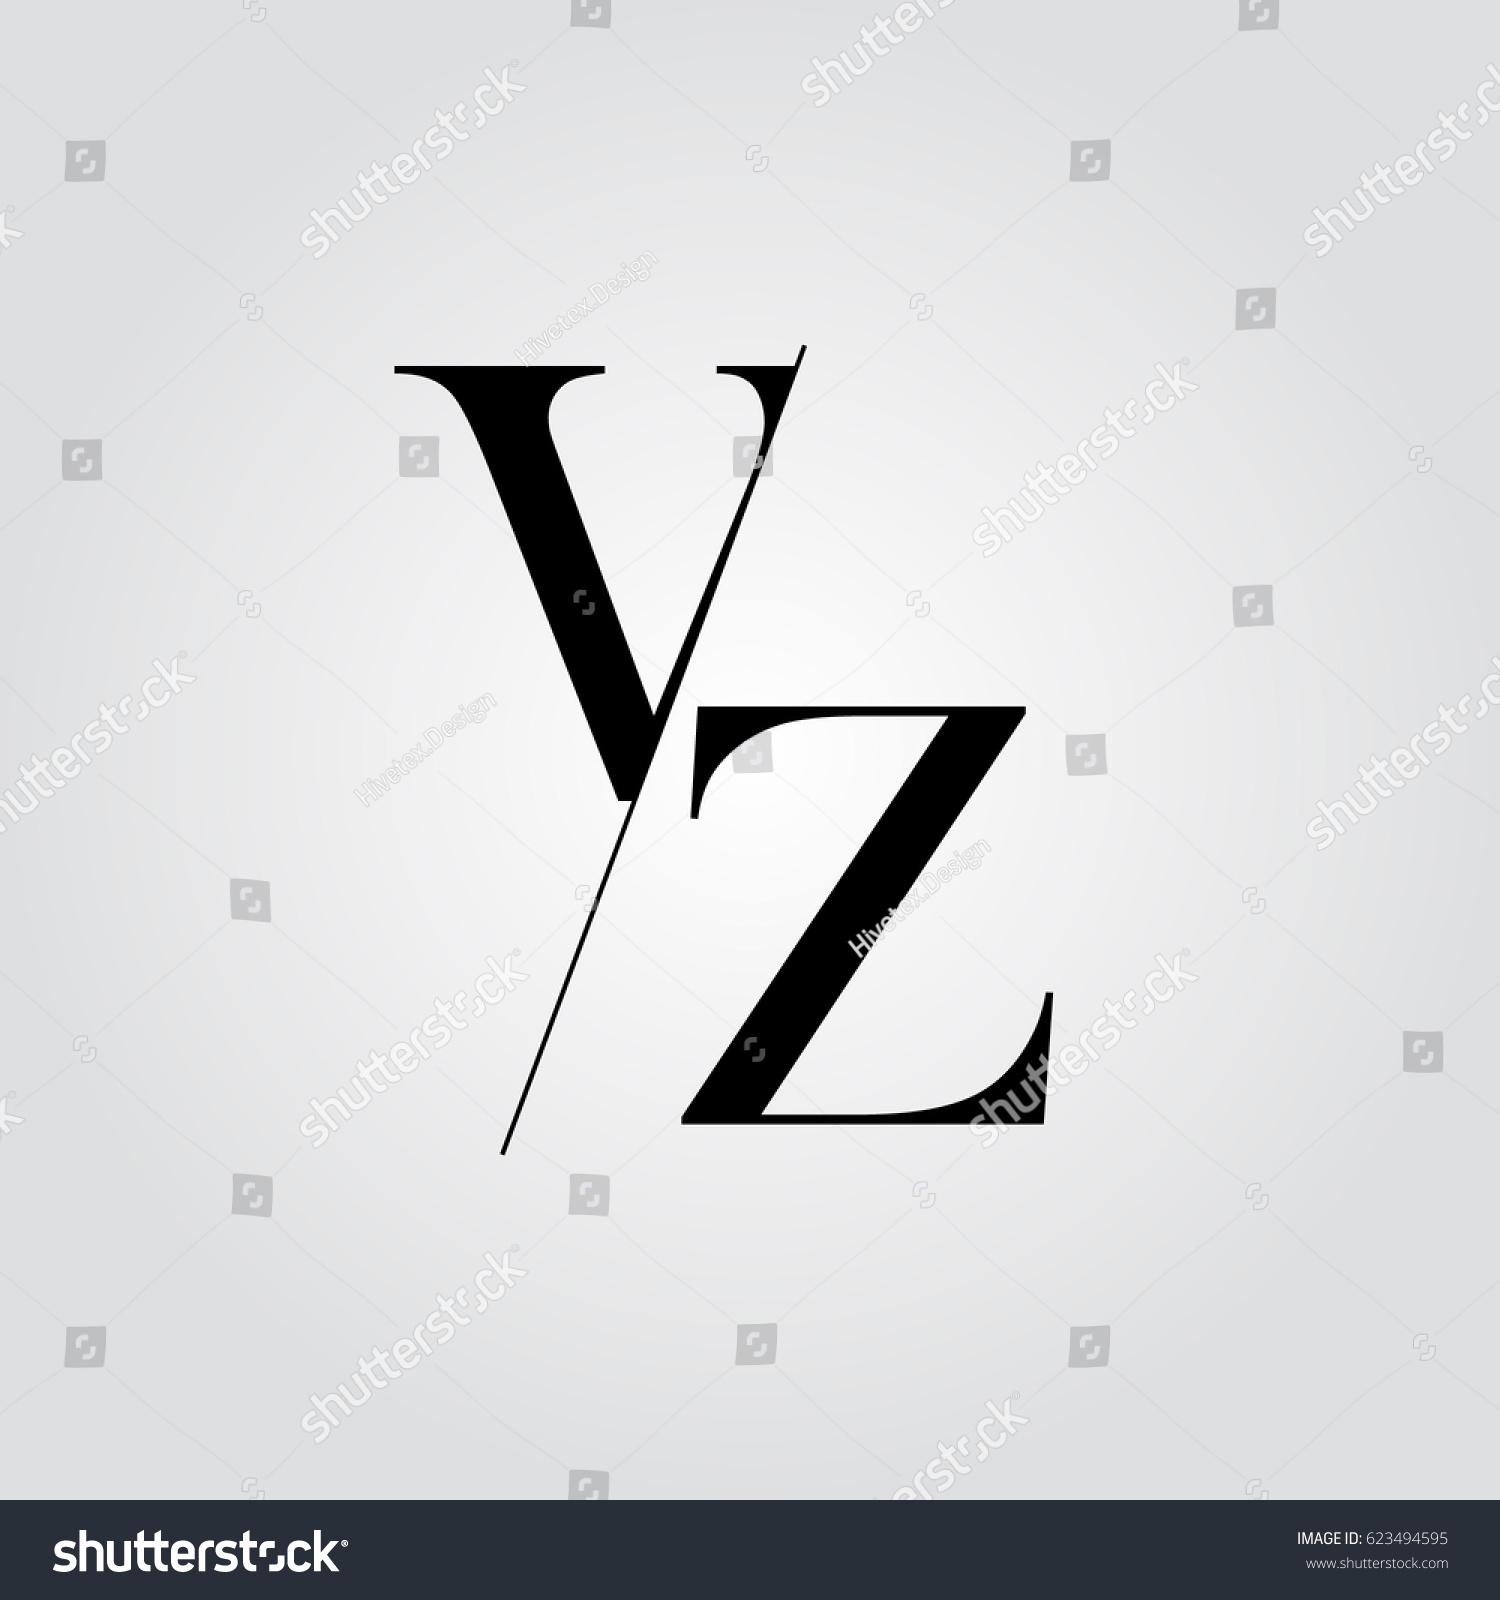 Vz logo stock vector 623494595 shutterstock vz logo biocorpaavc Image collections